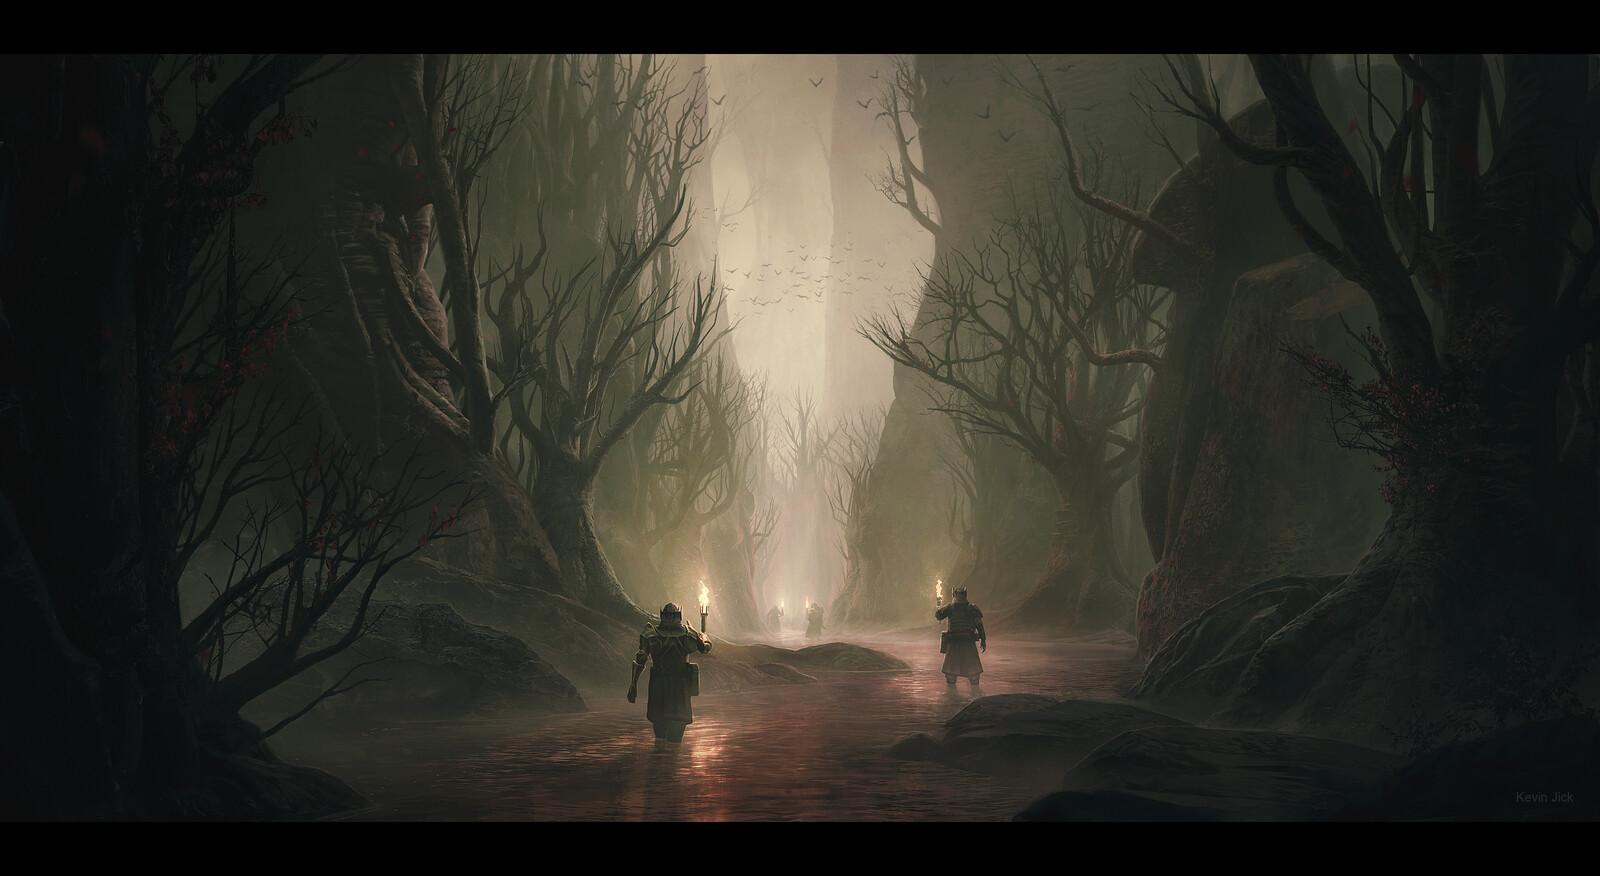 kevin-jick-kevinjick-thedarkswamp-final-1a.jpg